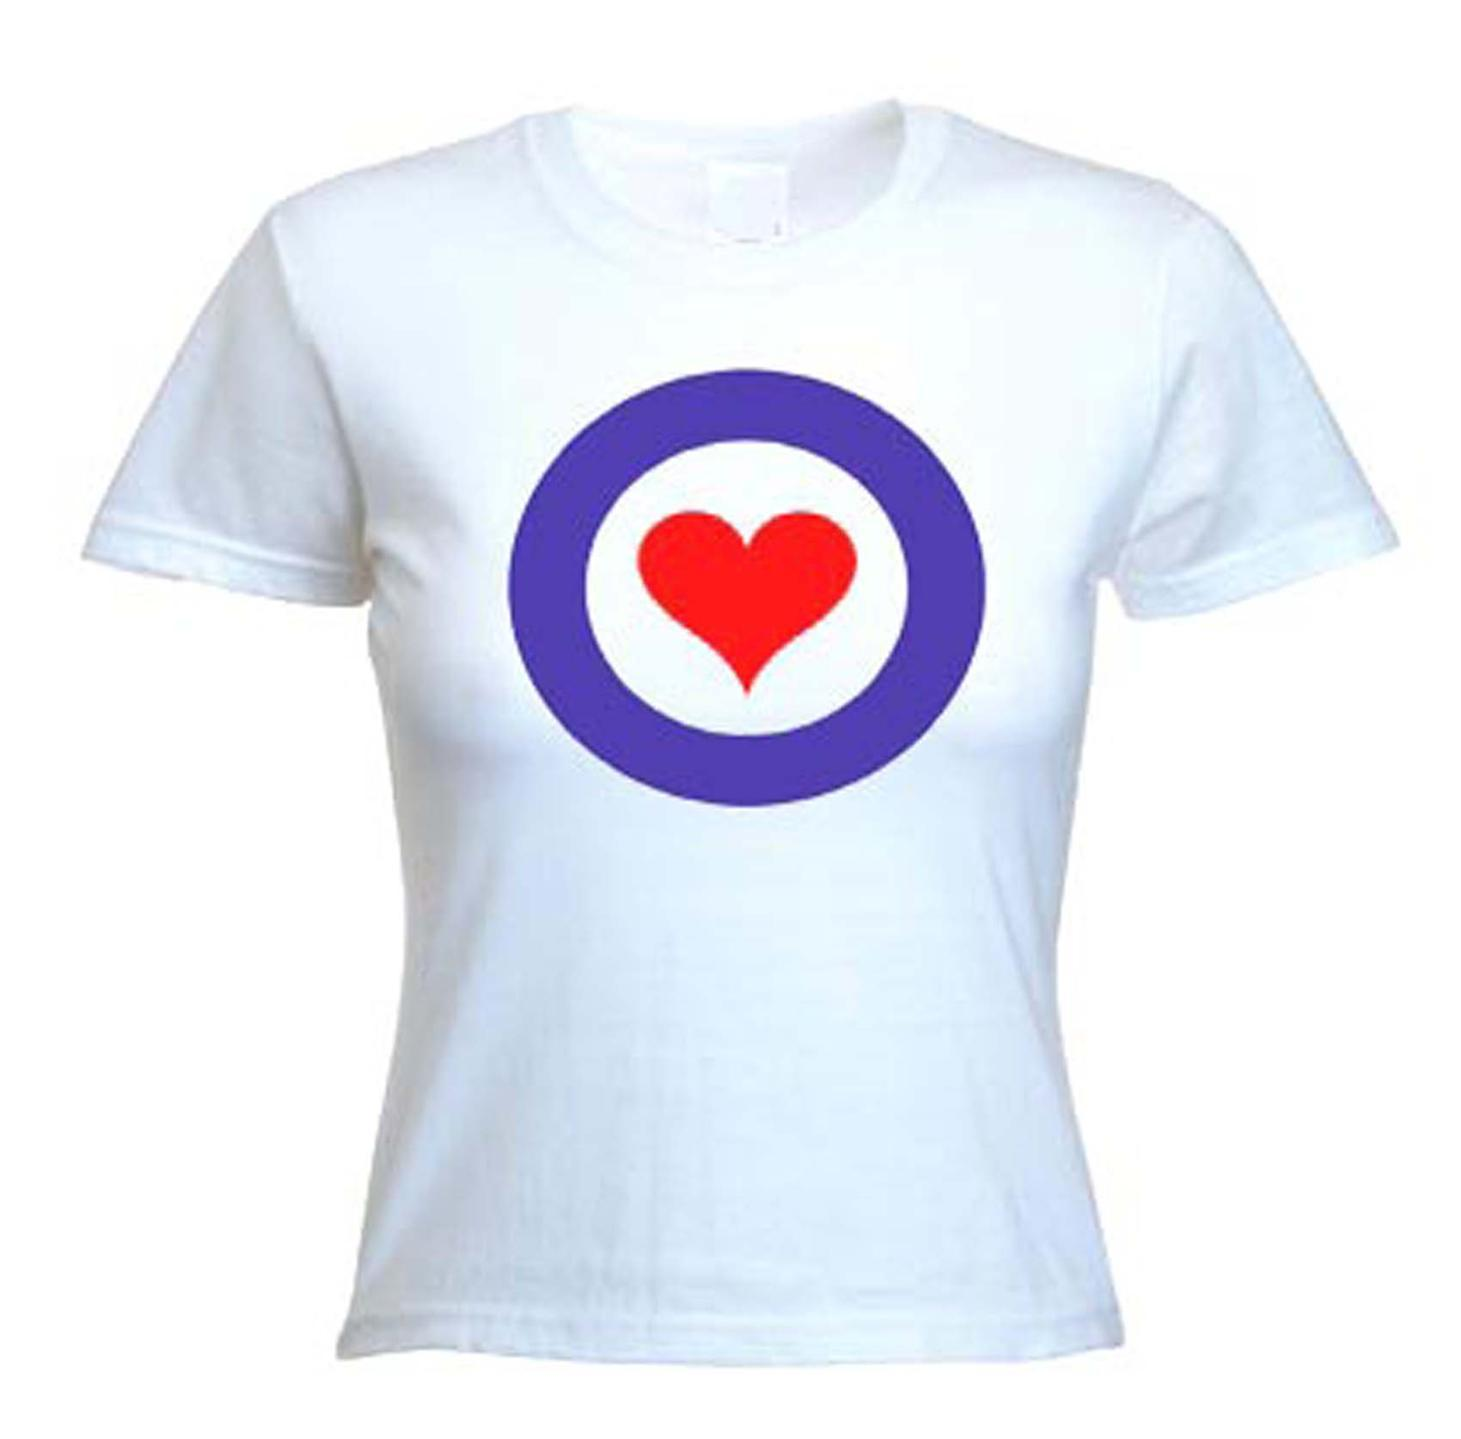 1f45358d52 MOD HEART LOGO WOMEN S T-SHIRT - Northern Soul Ska The Who Jam Target - S  to XL